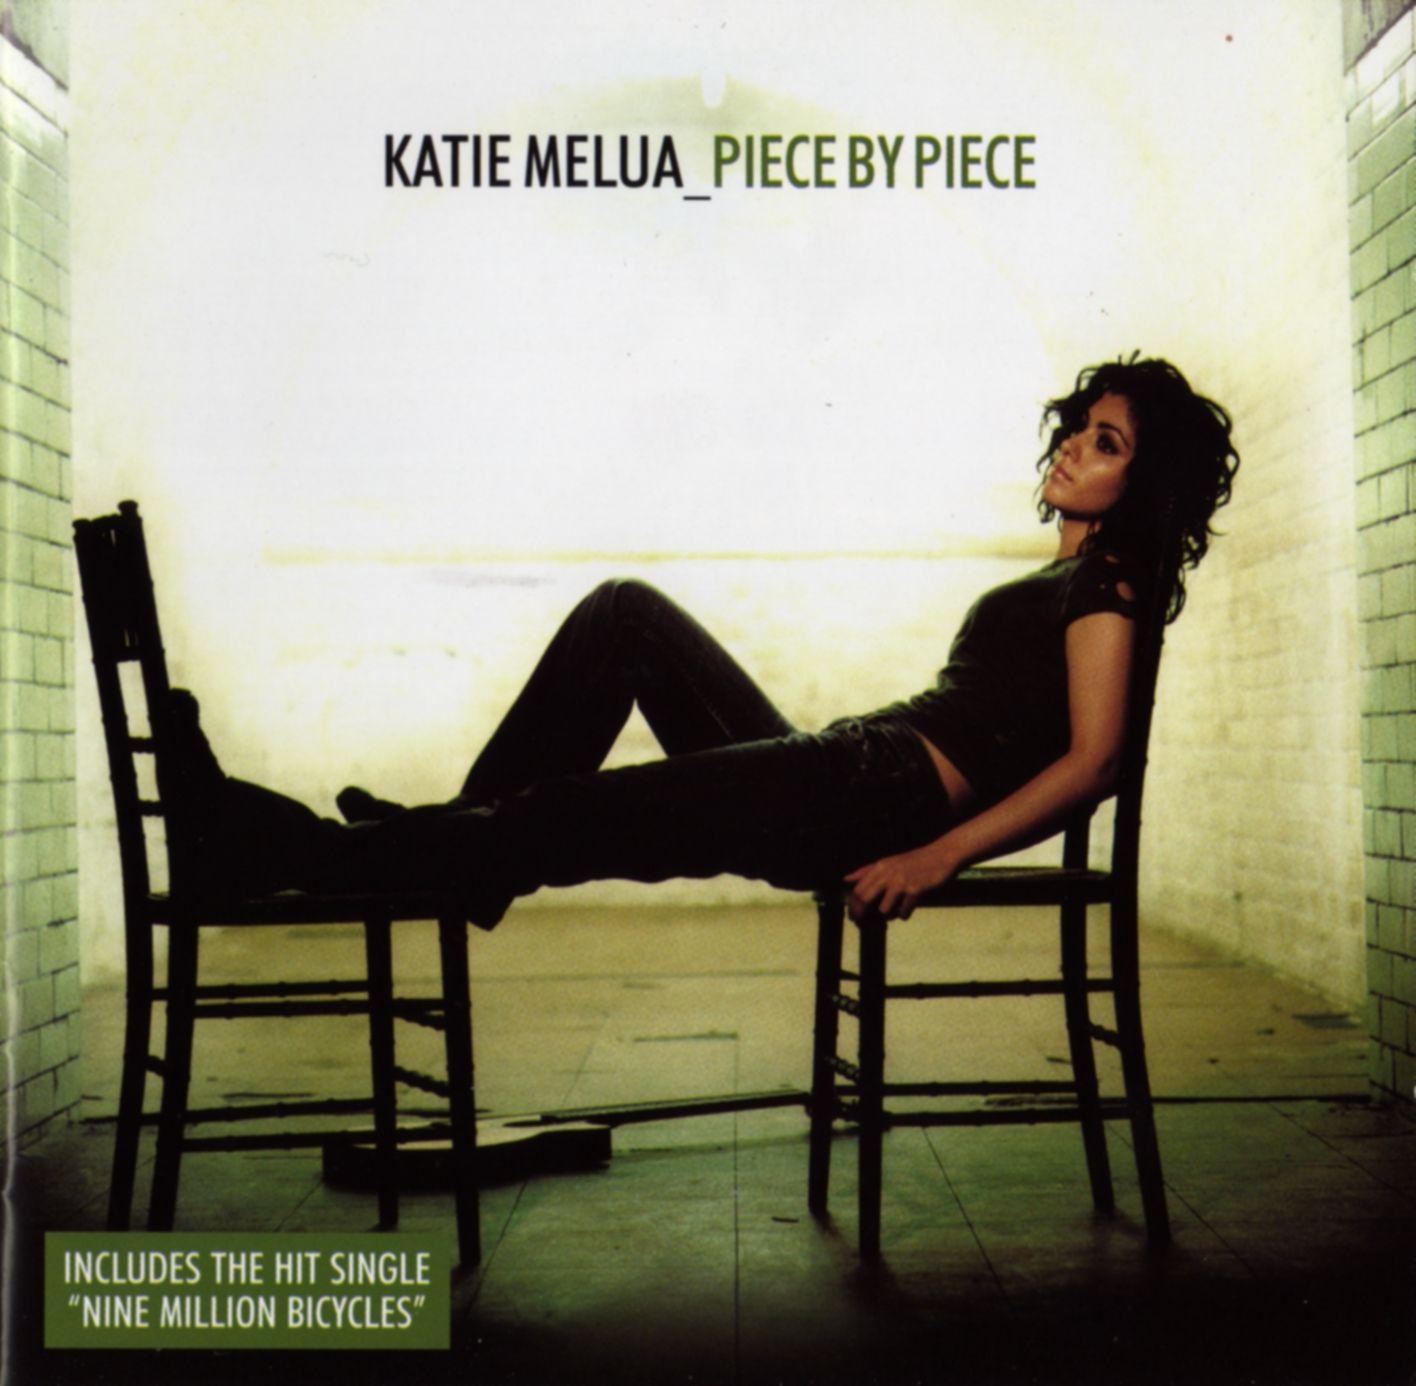 Katie Melua - Piece By Piece album cover